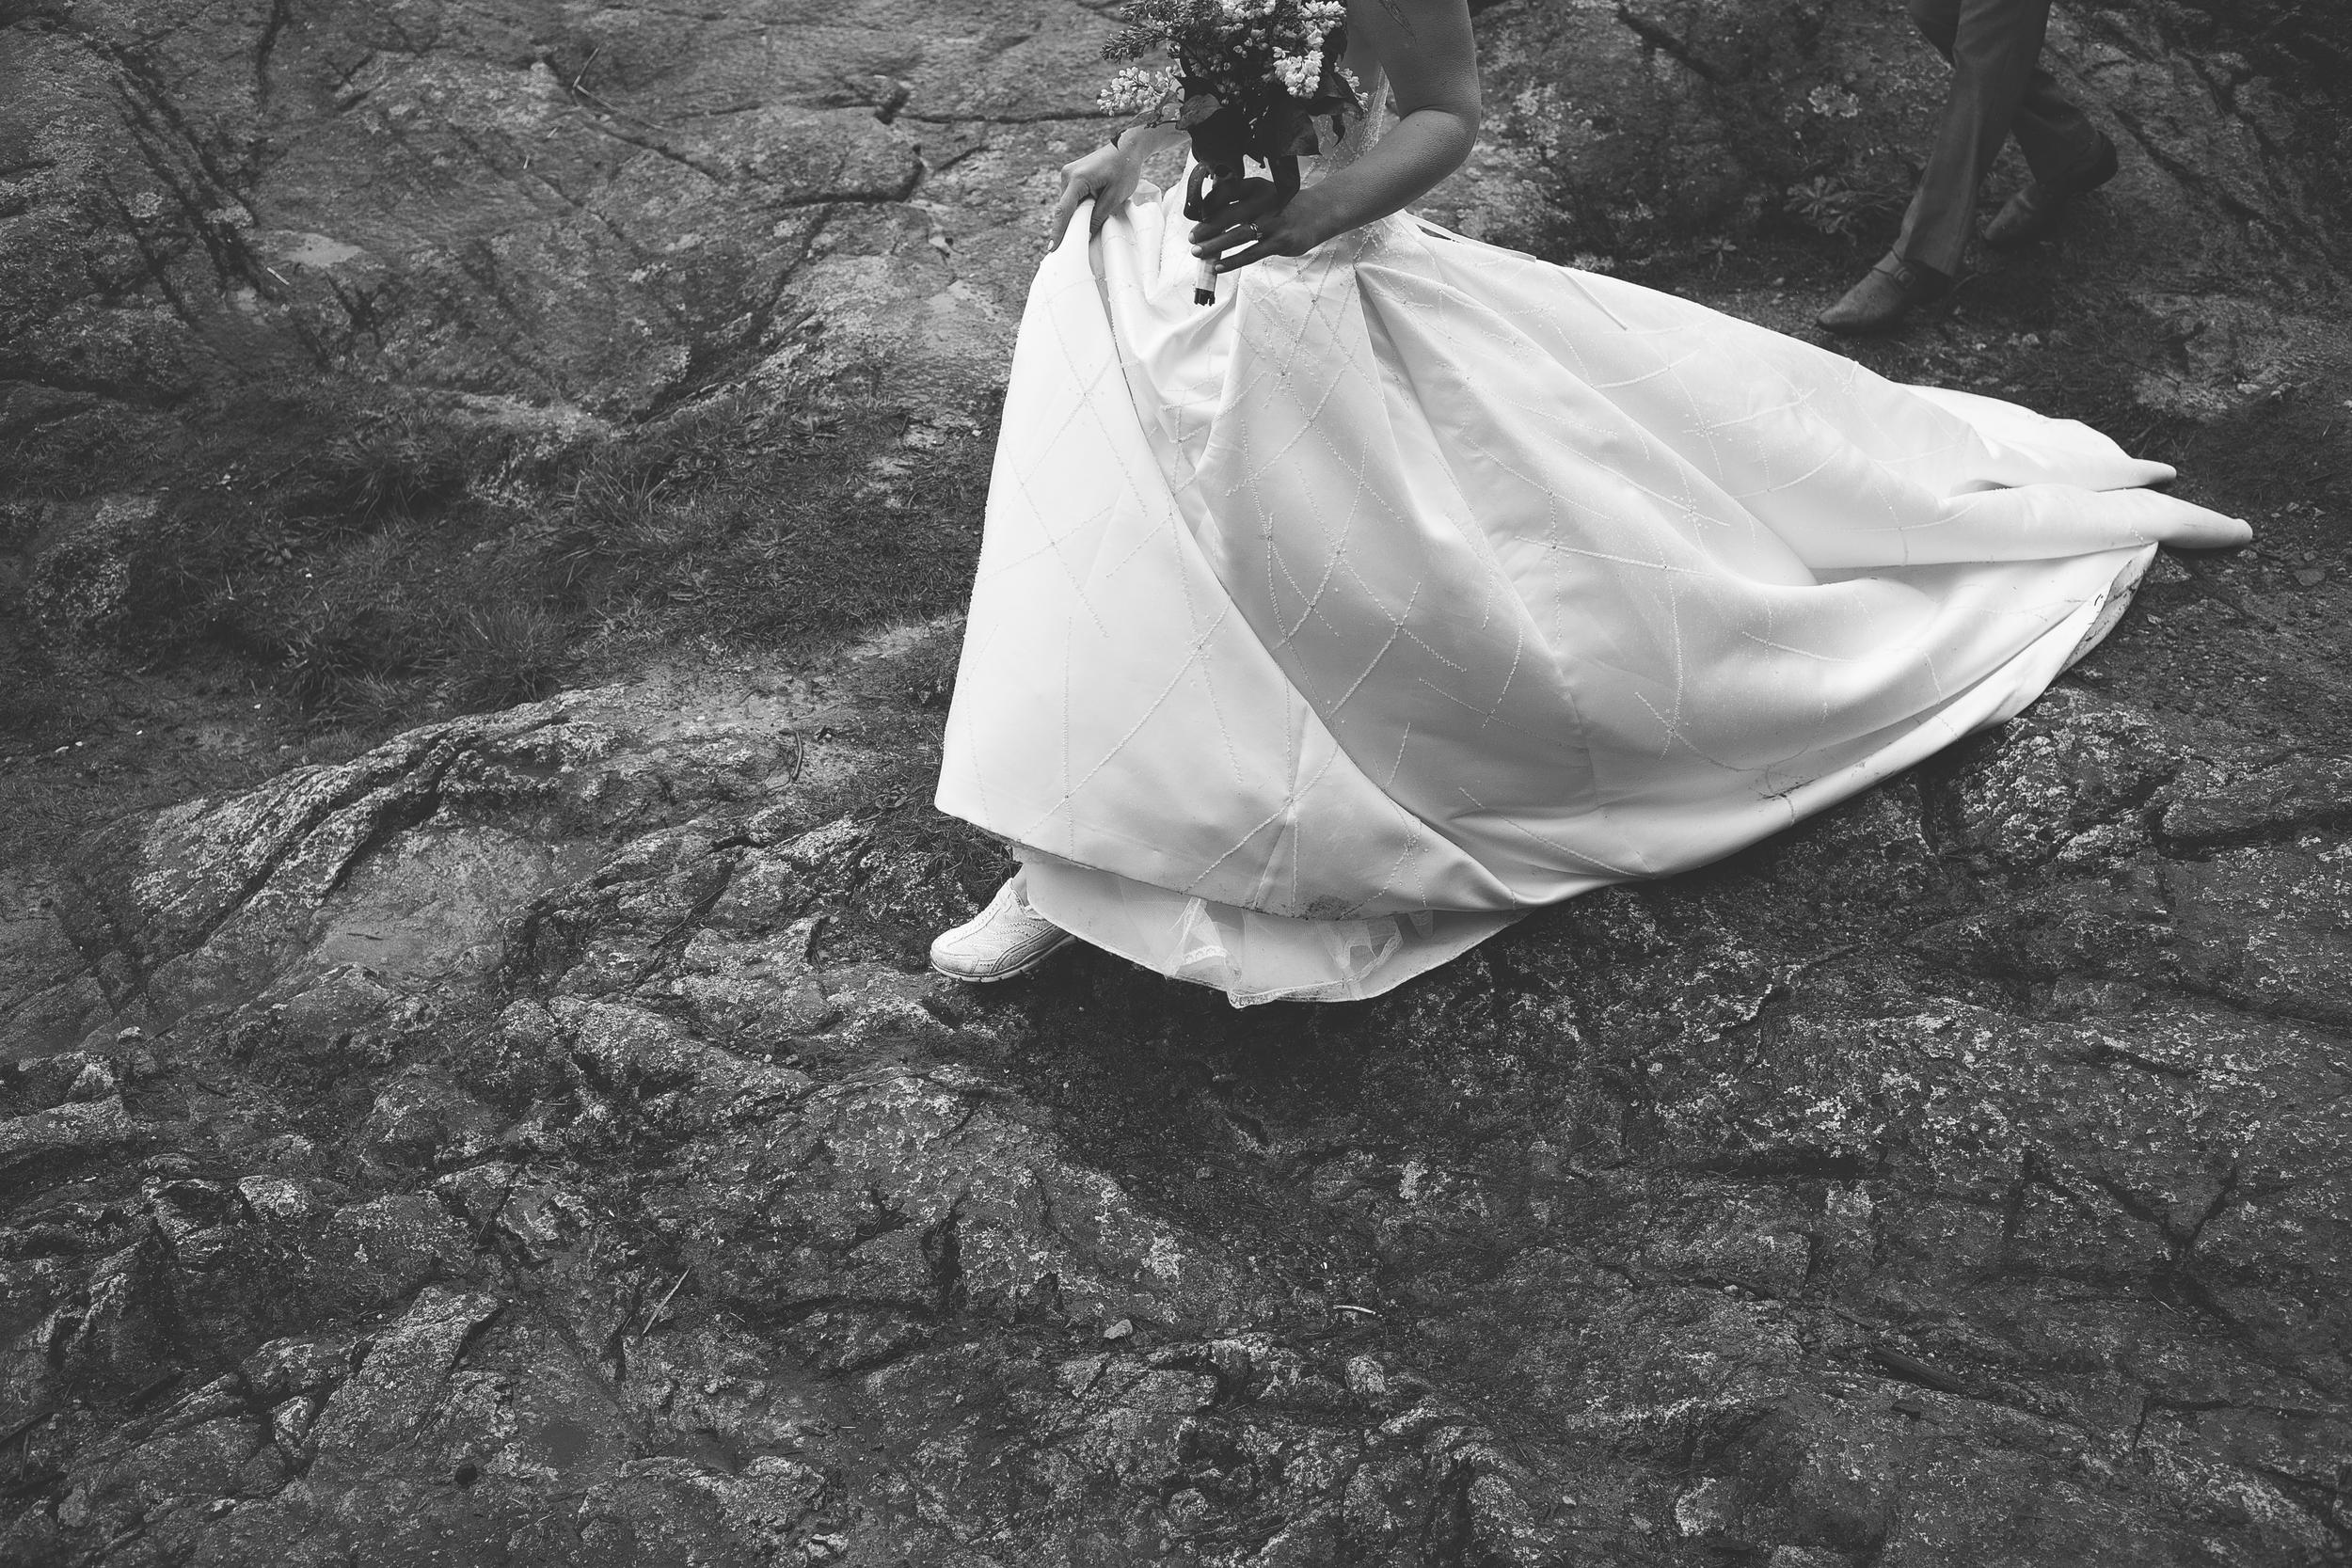 vancouver_photographer_wedding_DogwoodPhotography-13.jpg